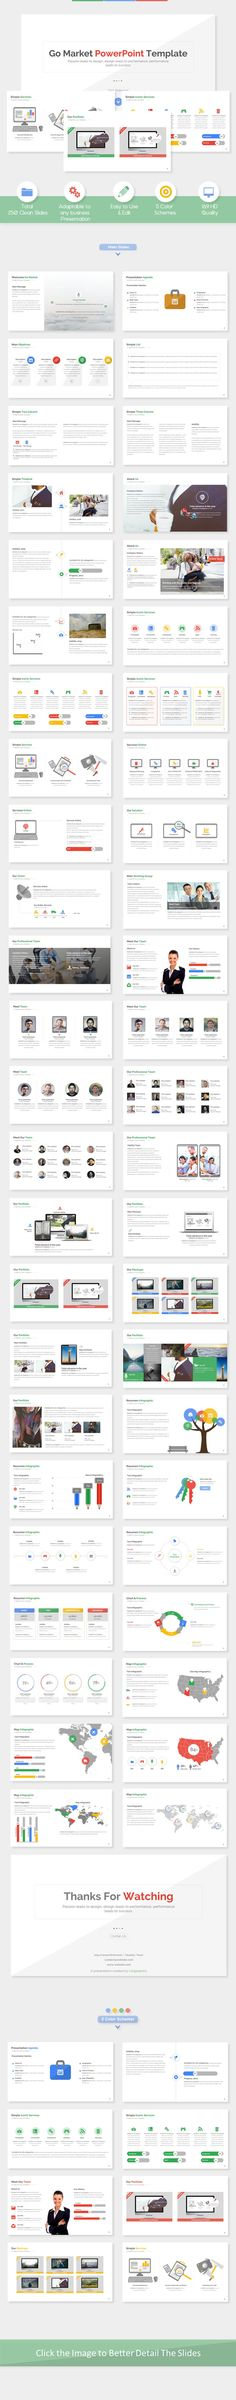 Go Market - Powerpoint Template (PowerPoint Templates)